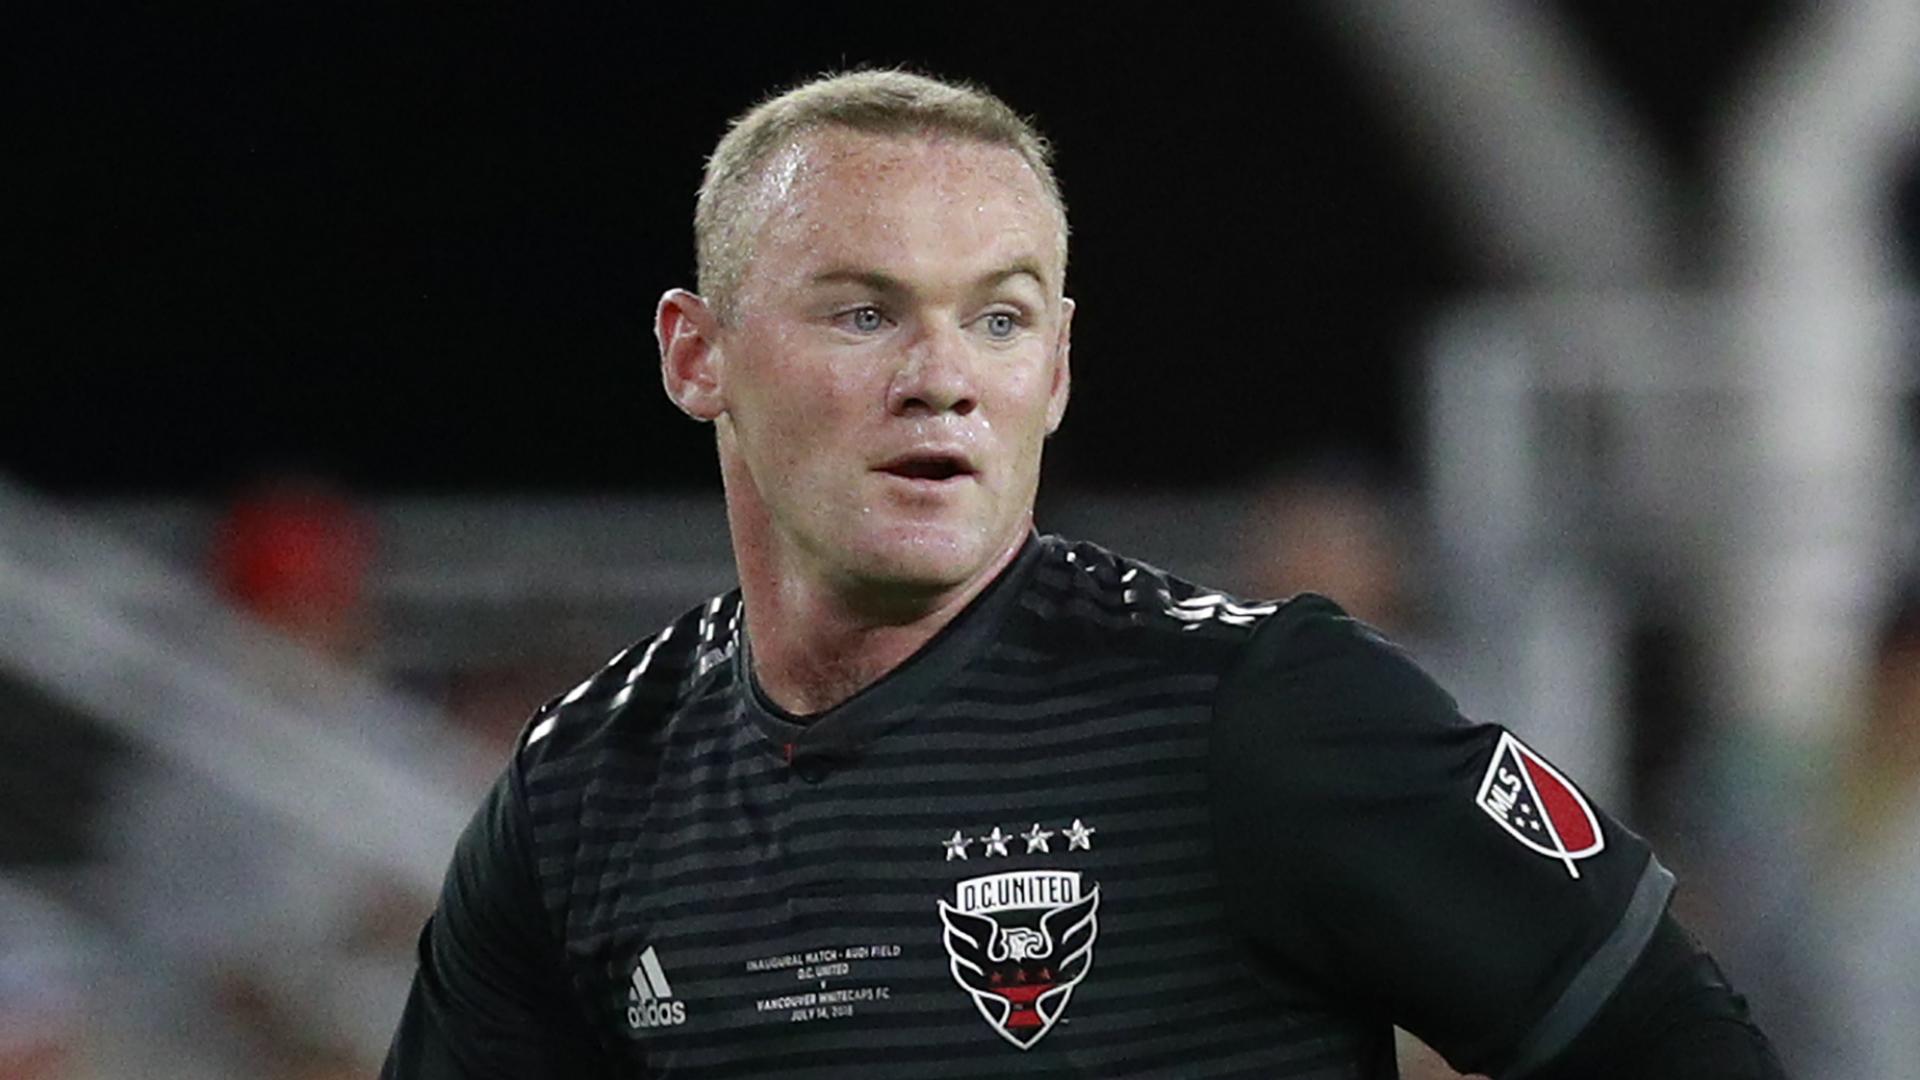 WATCH: Wayne Rooney scores wonderful free kick for DC United